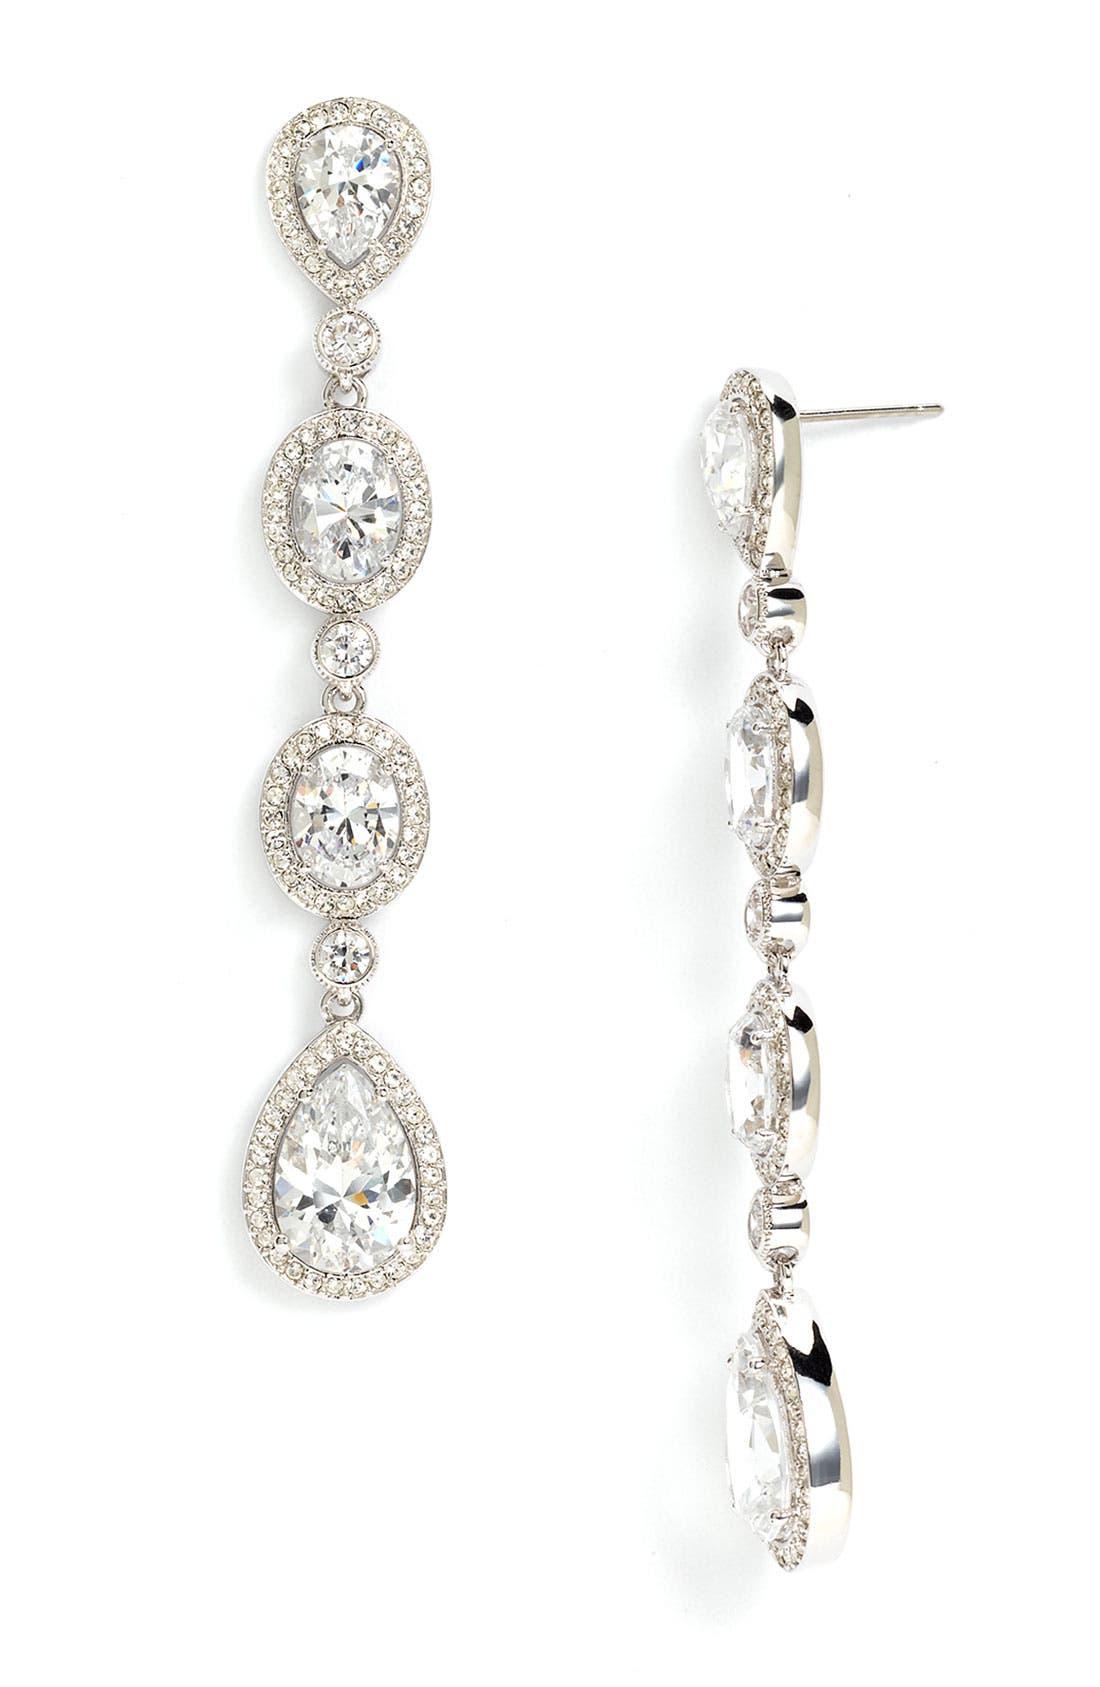 Main Image - Nadri Framed Cubic Zirconia Earrings